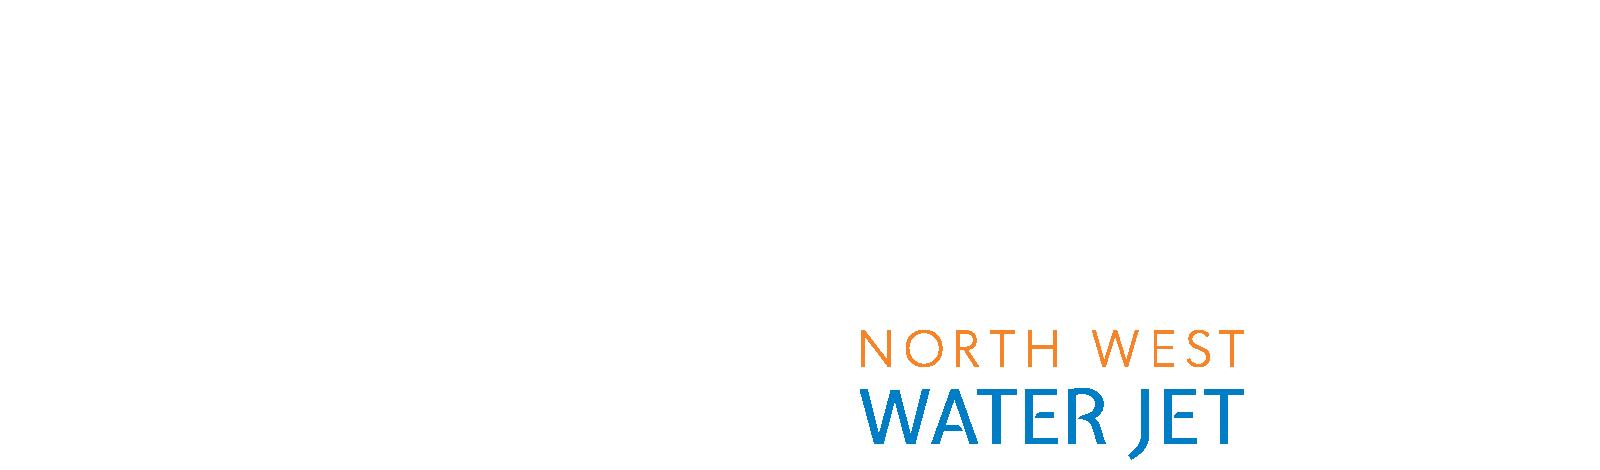 Northwest Waterjet Logo